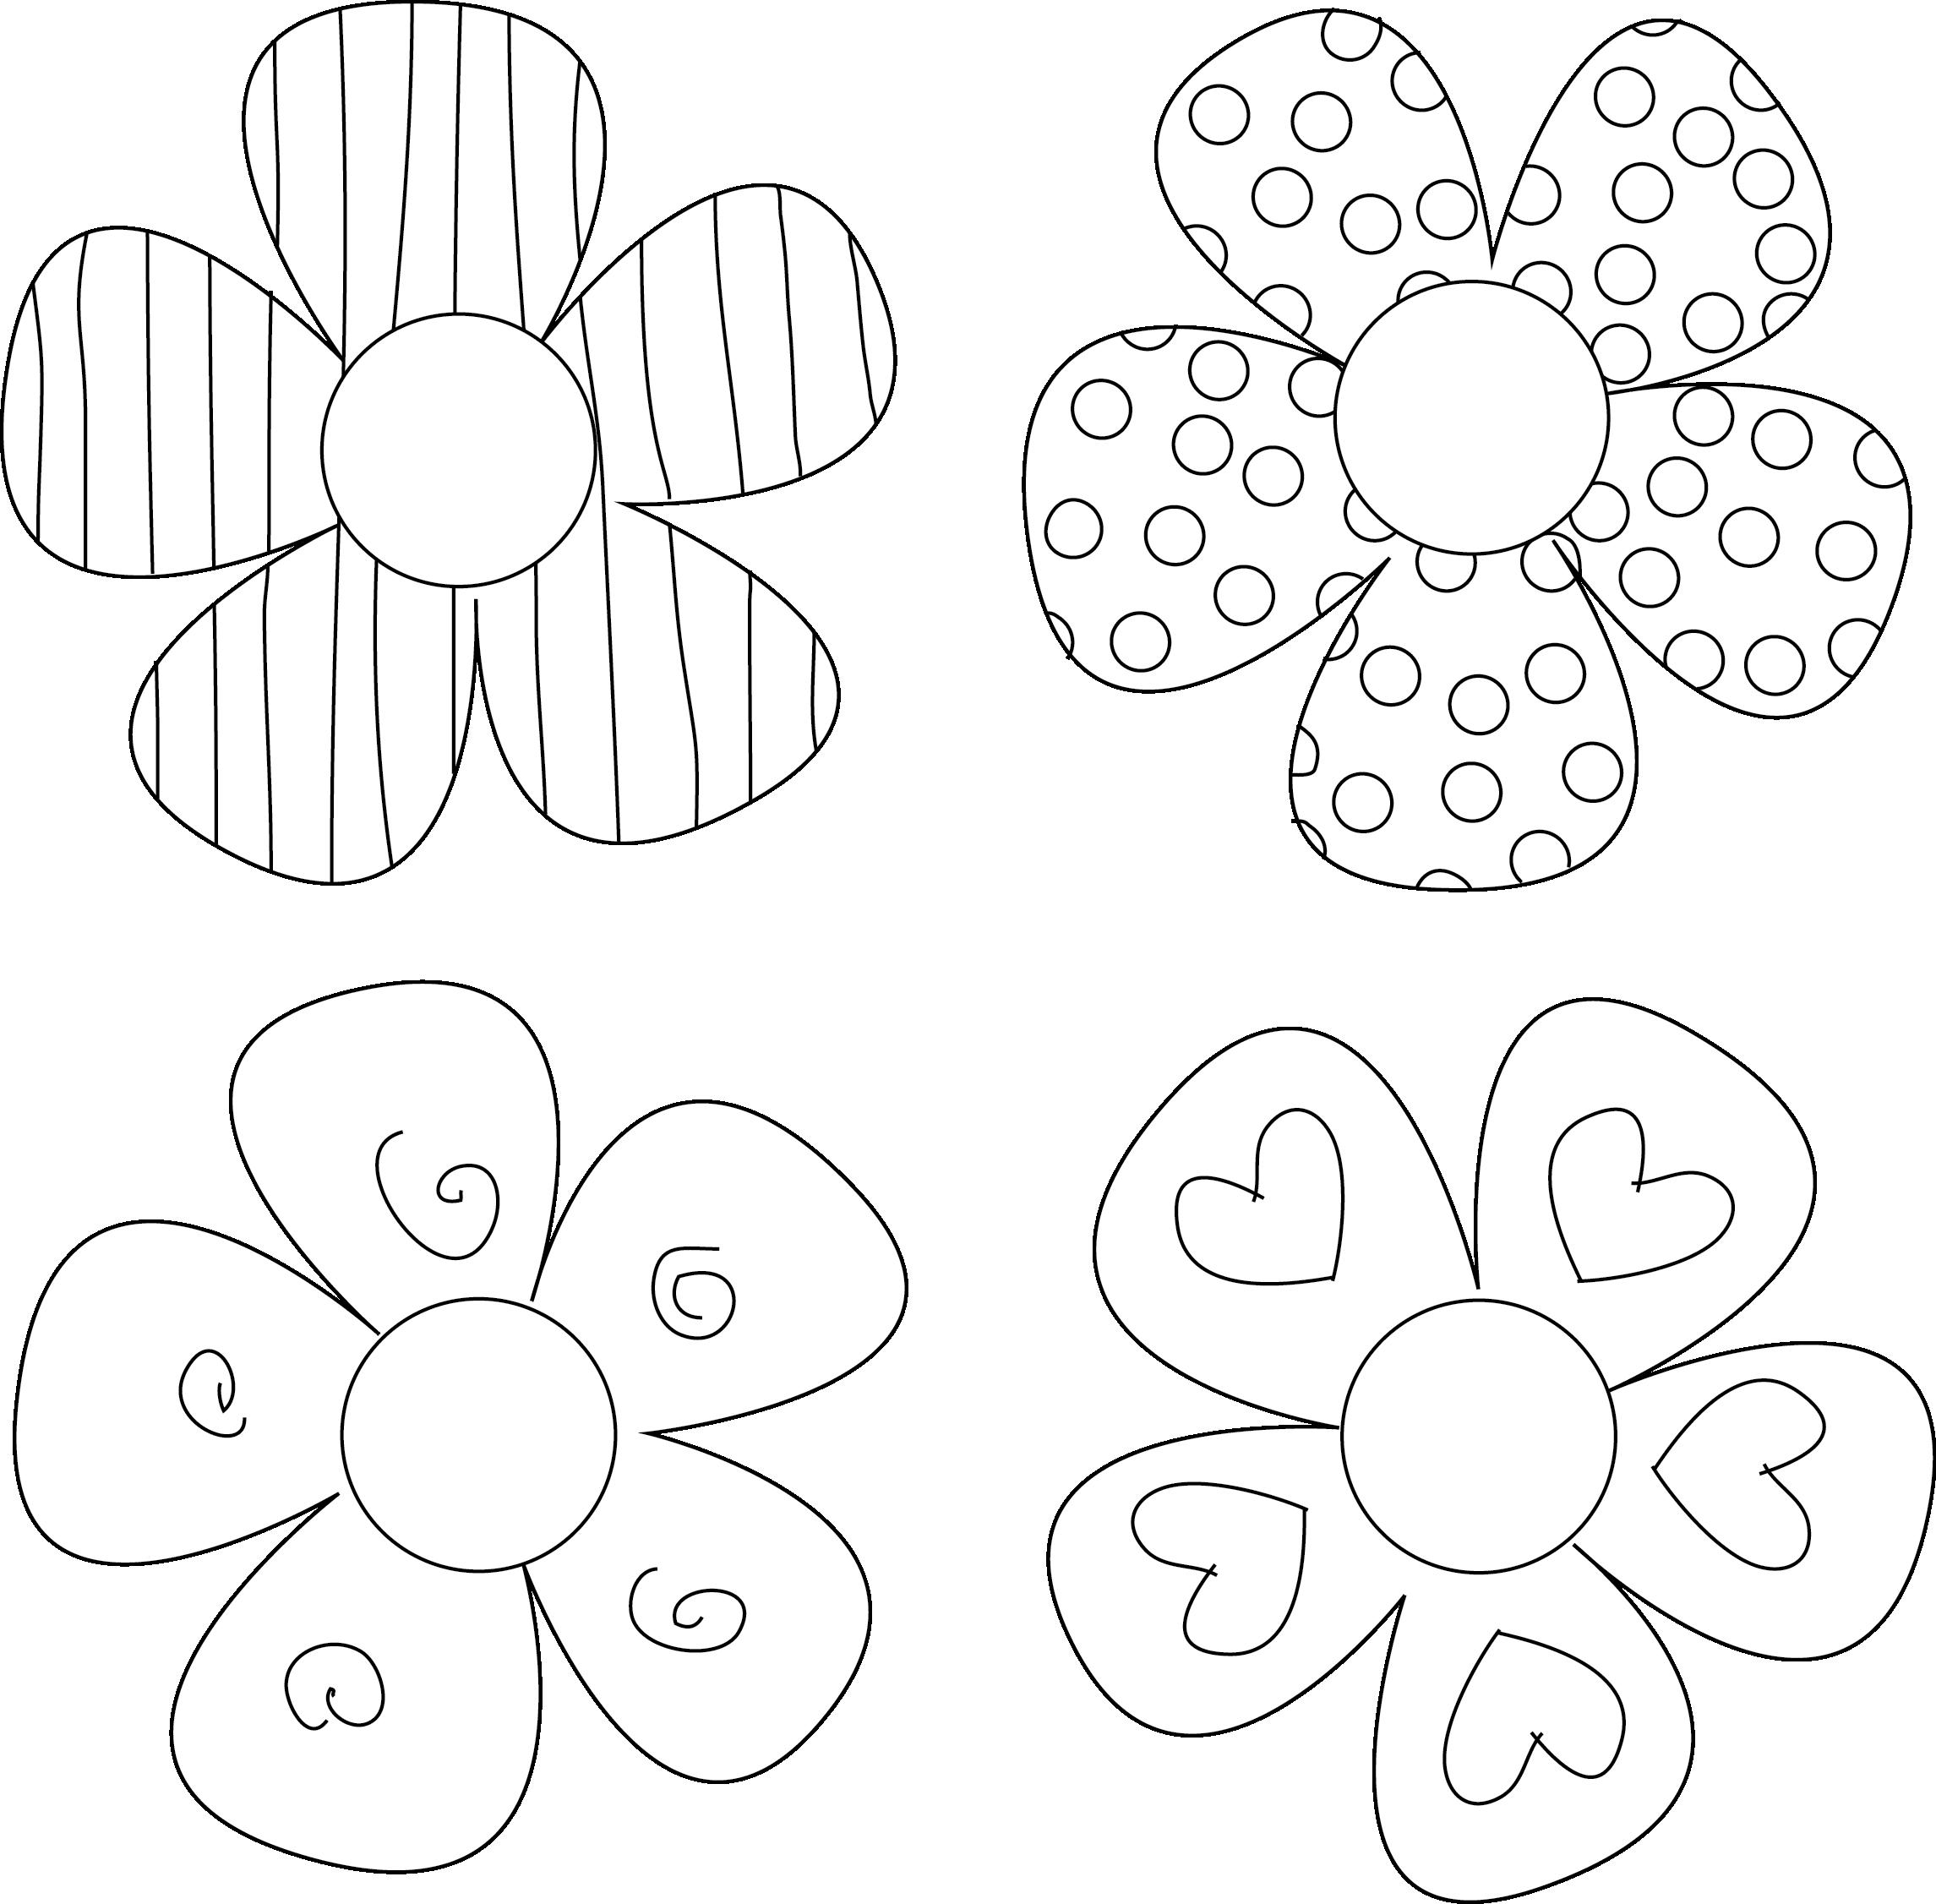 Noche buena flower clipart jpg freeuse download cut out applique | Flower Template ... | Project Ideas | Pinterest ... jpg freeuse download